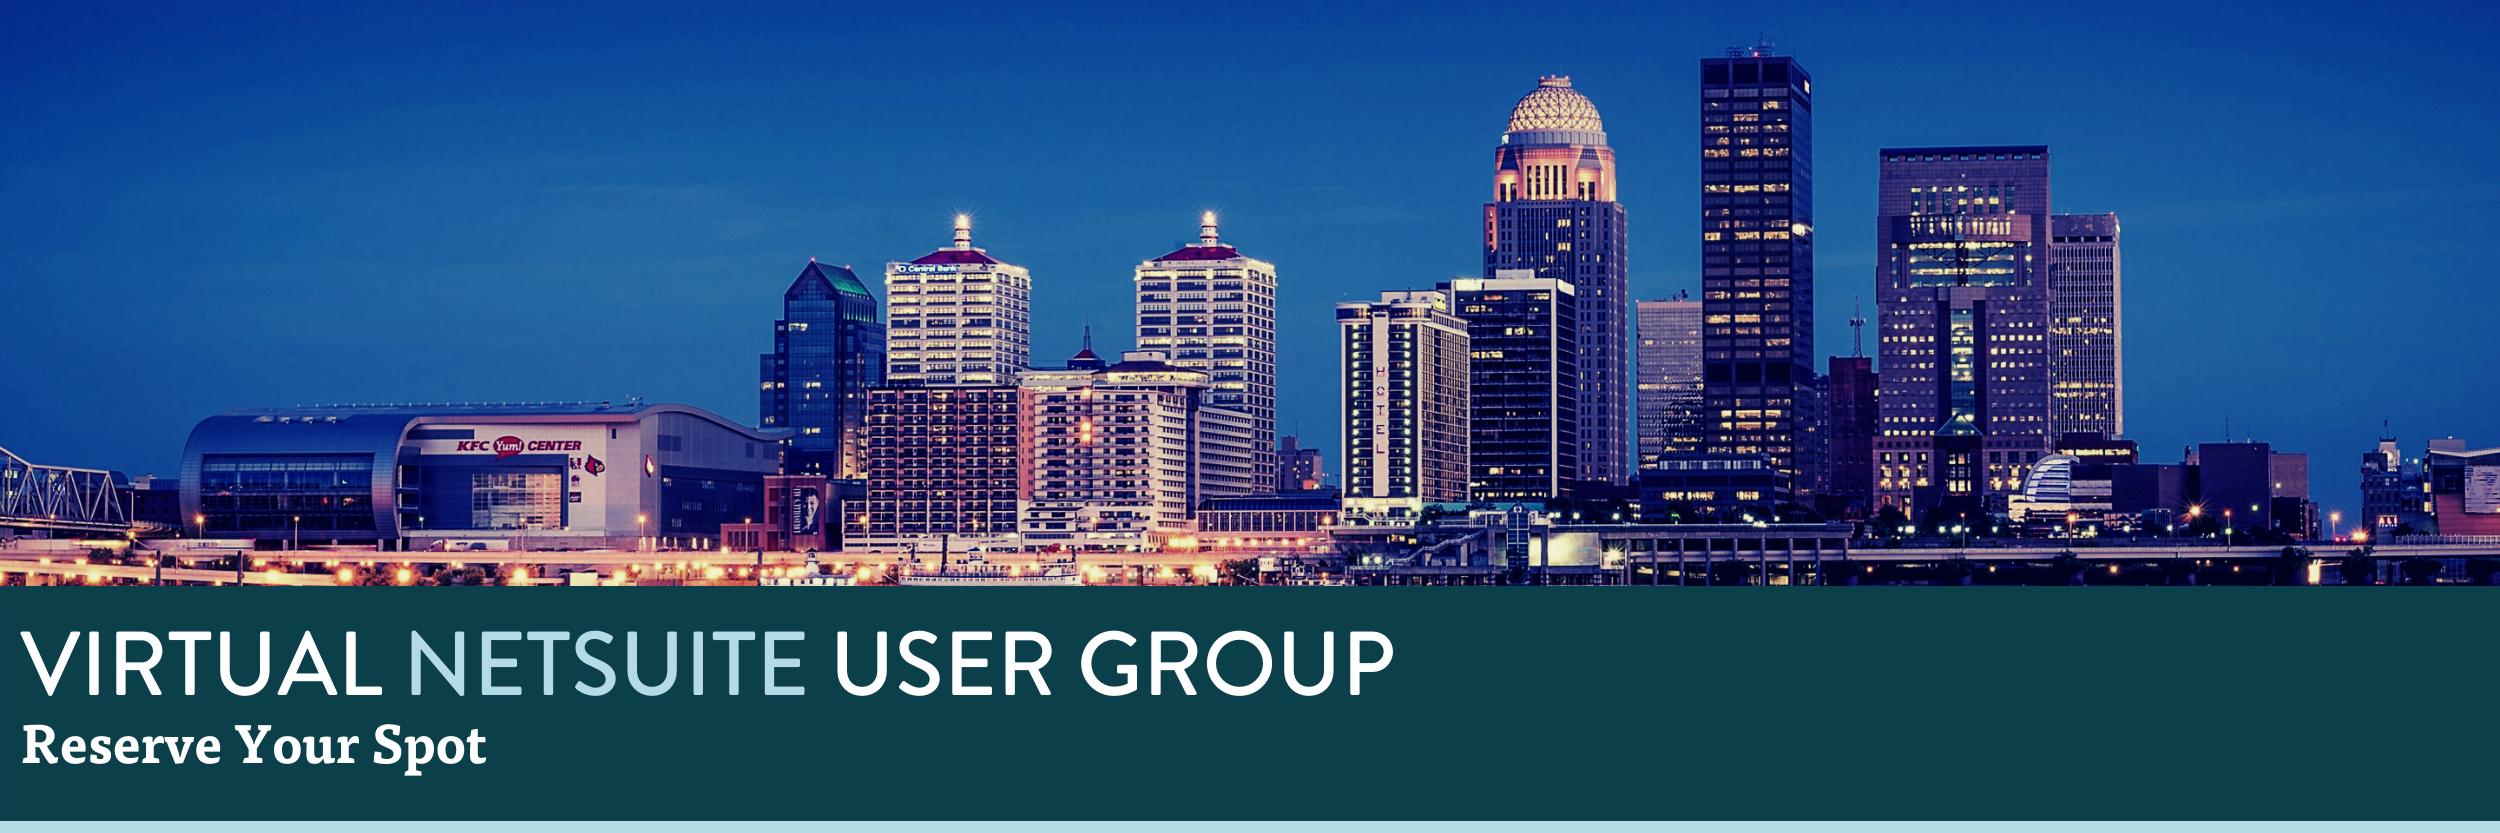 Virtual NetSuite User Group